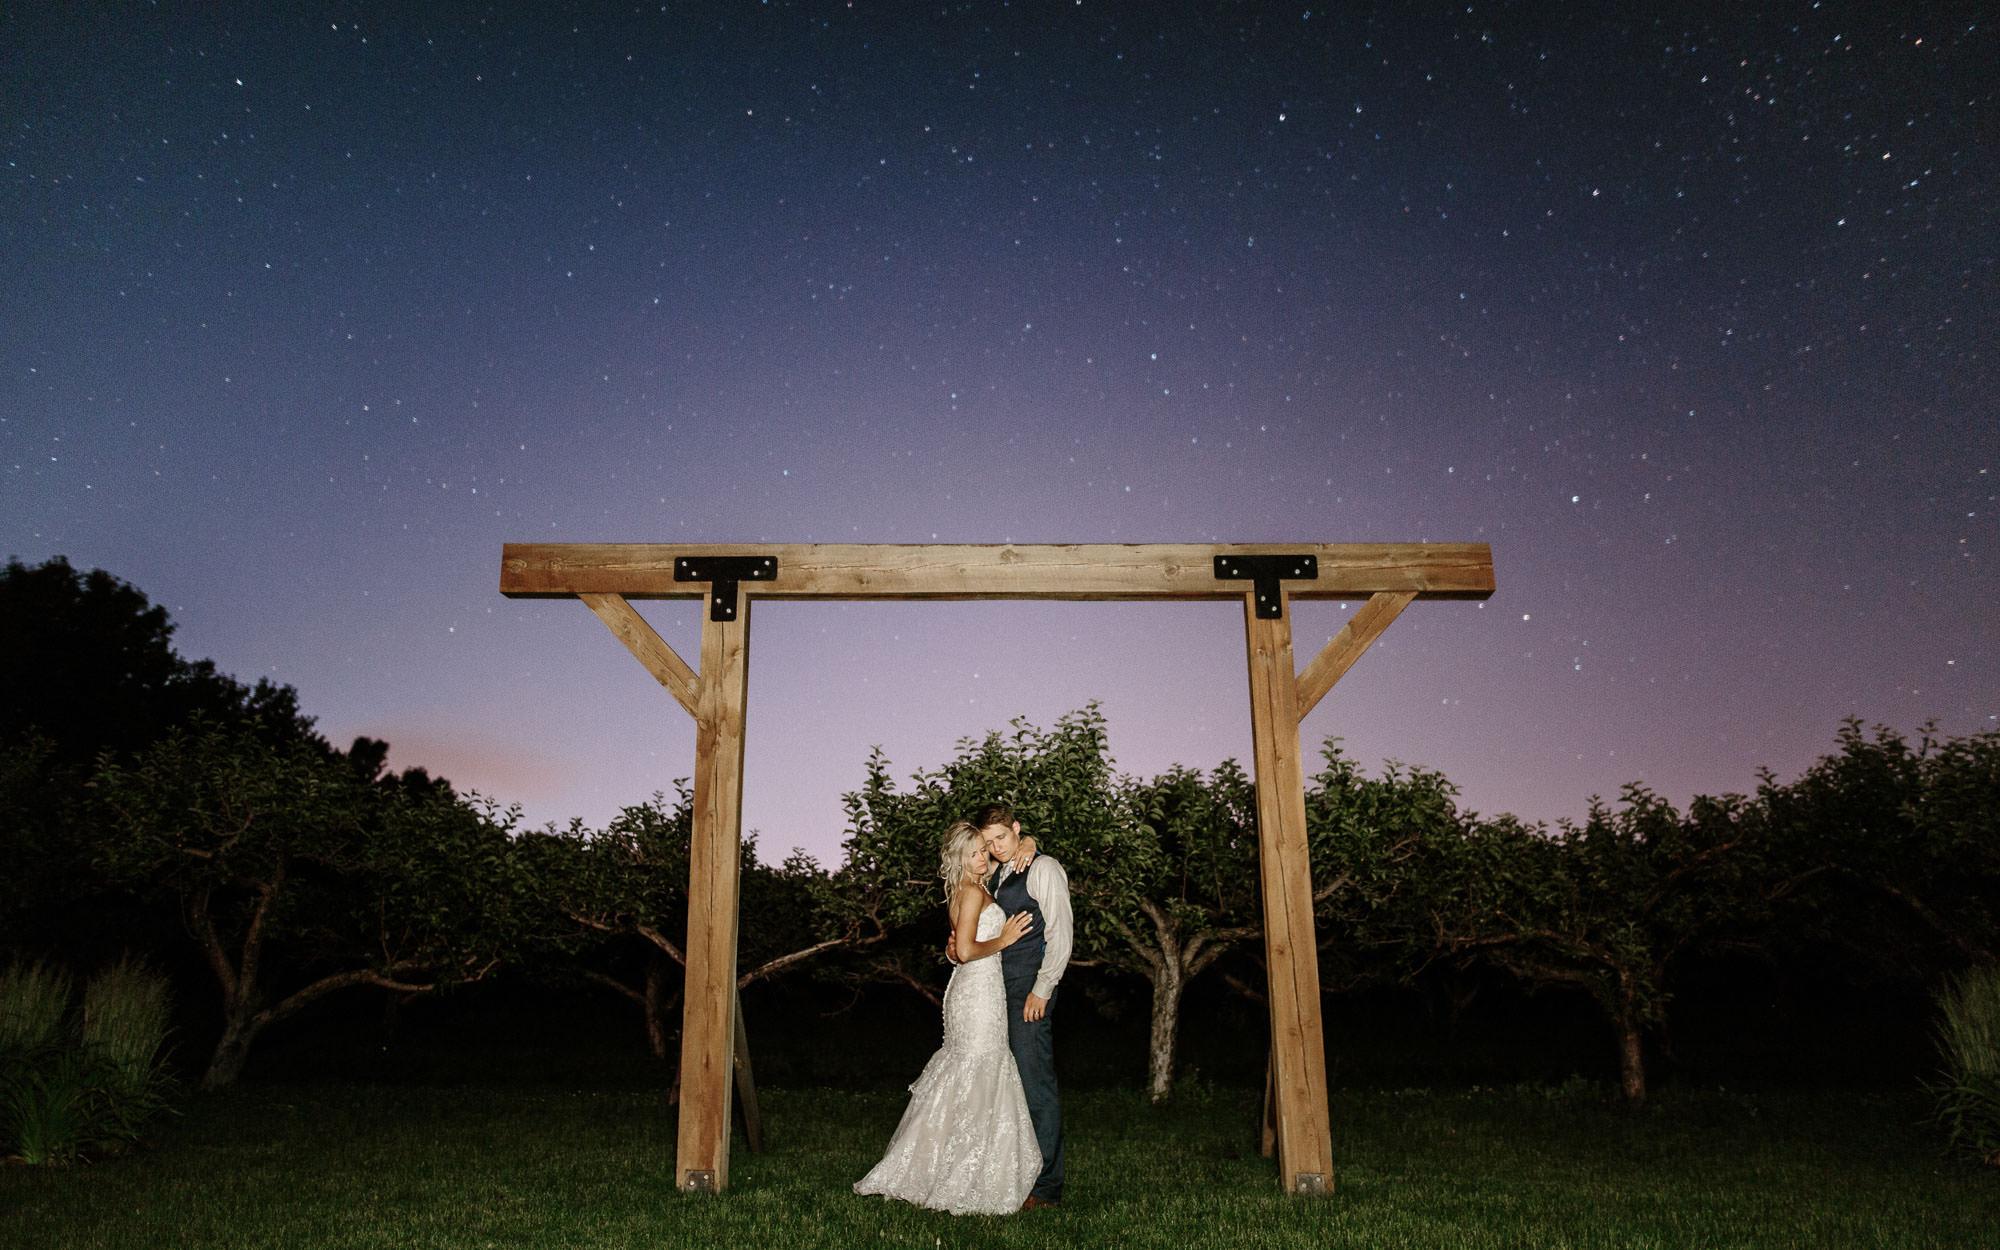 meadow-barn-wedding-sioux-falls-south-dakota-romantic-adventerous-michael-liedtke-photography137.jpg